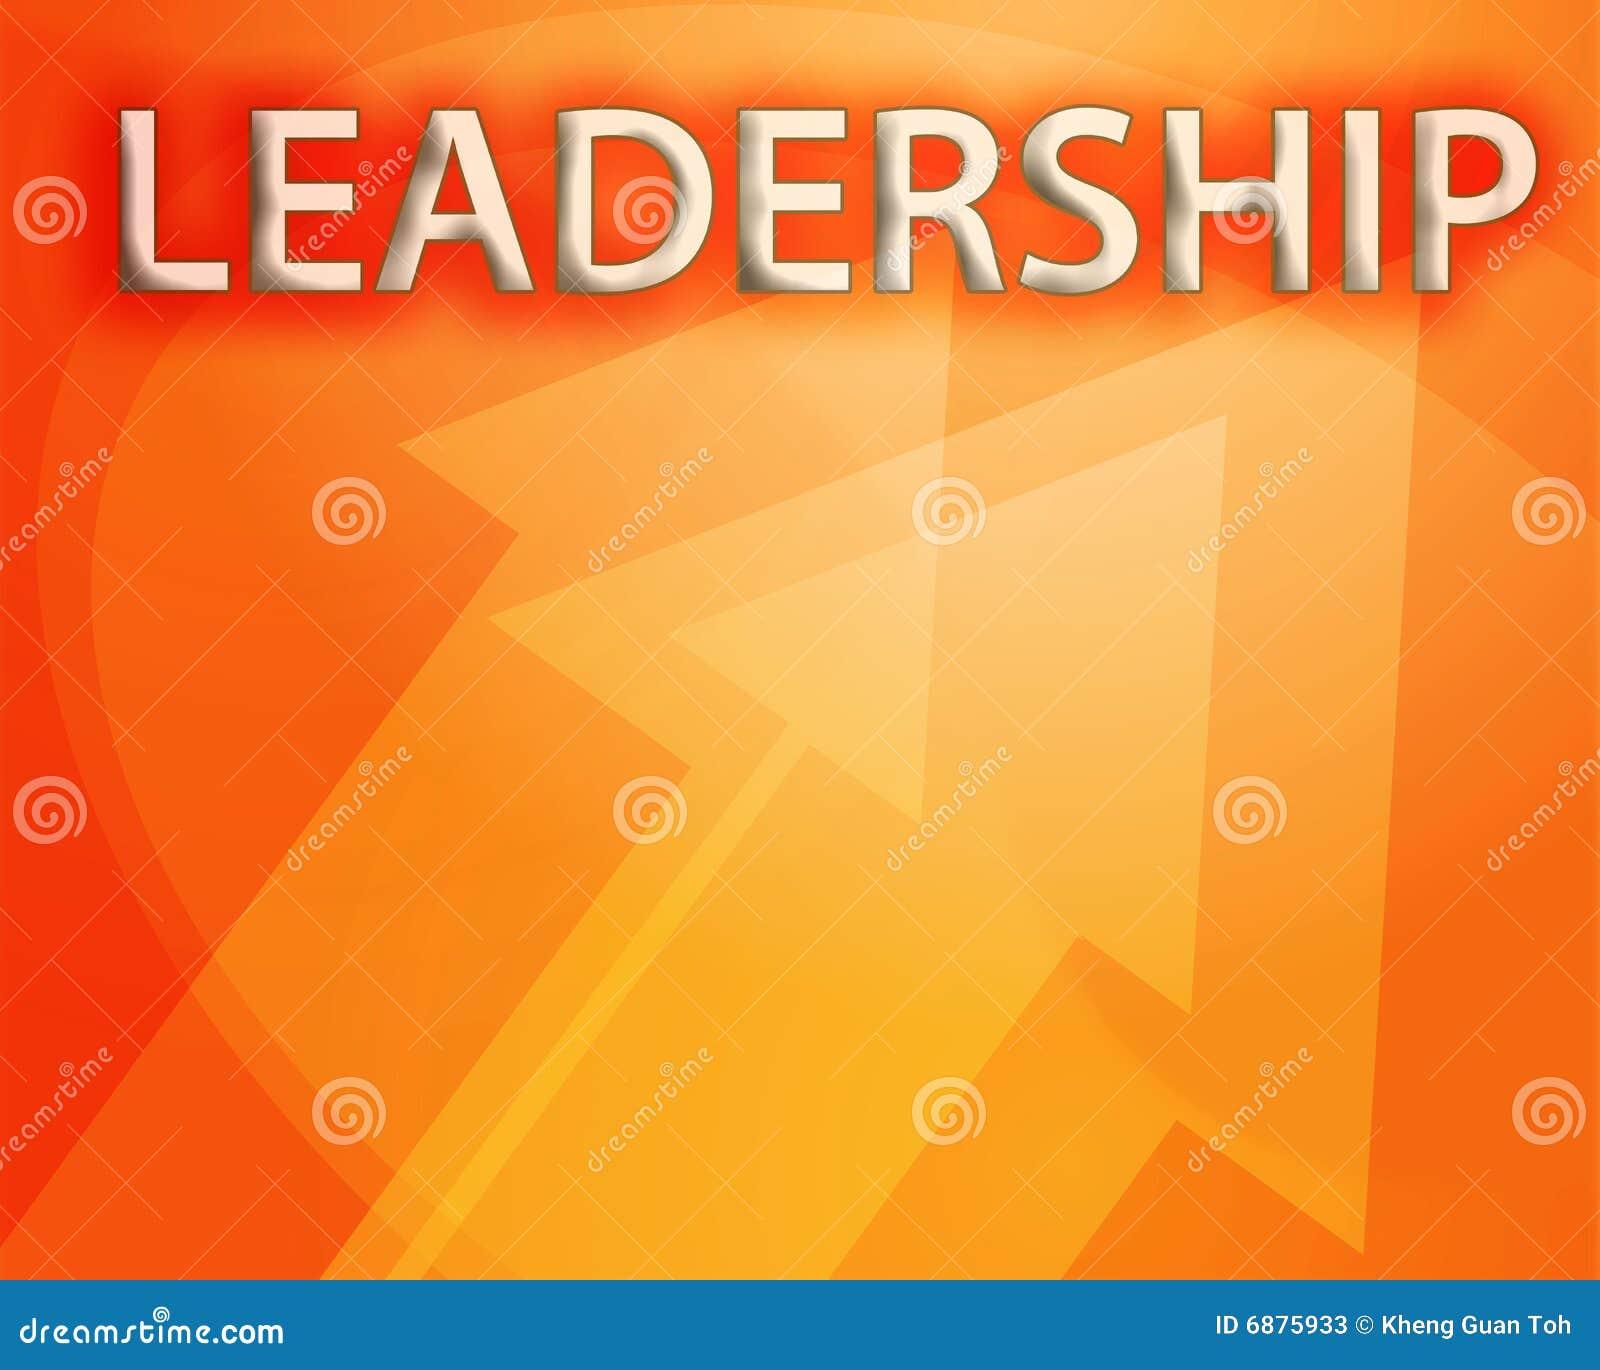 Leadership Illustration Stock Illustration  Image Of